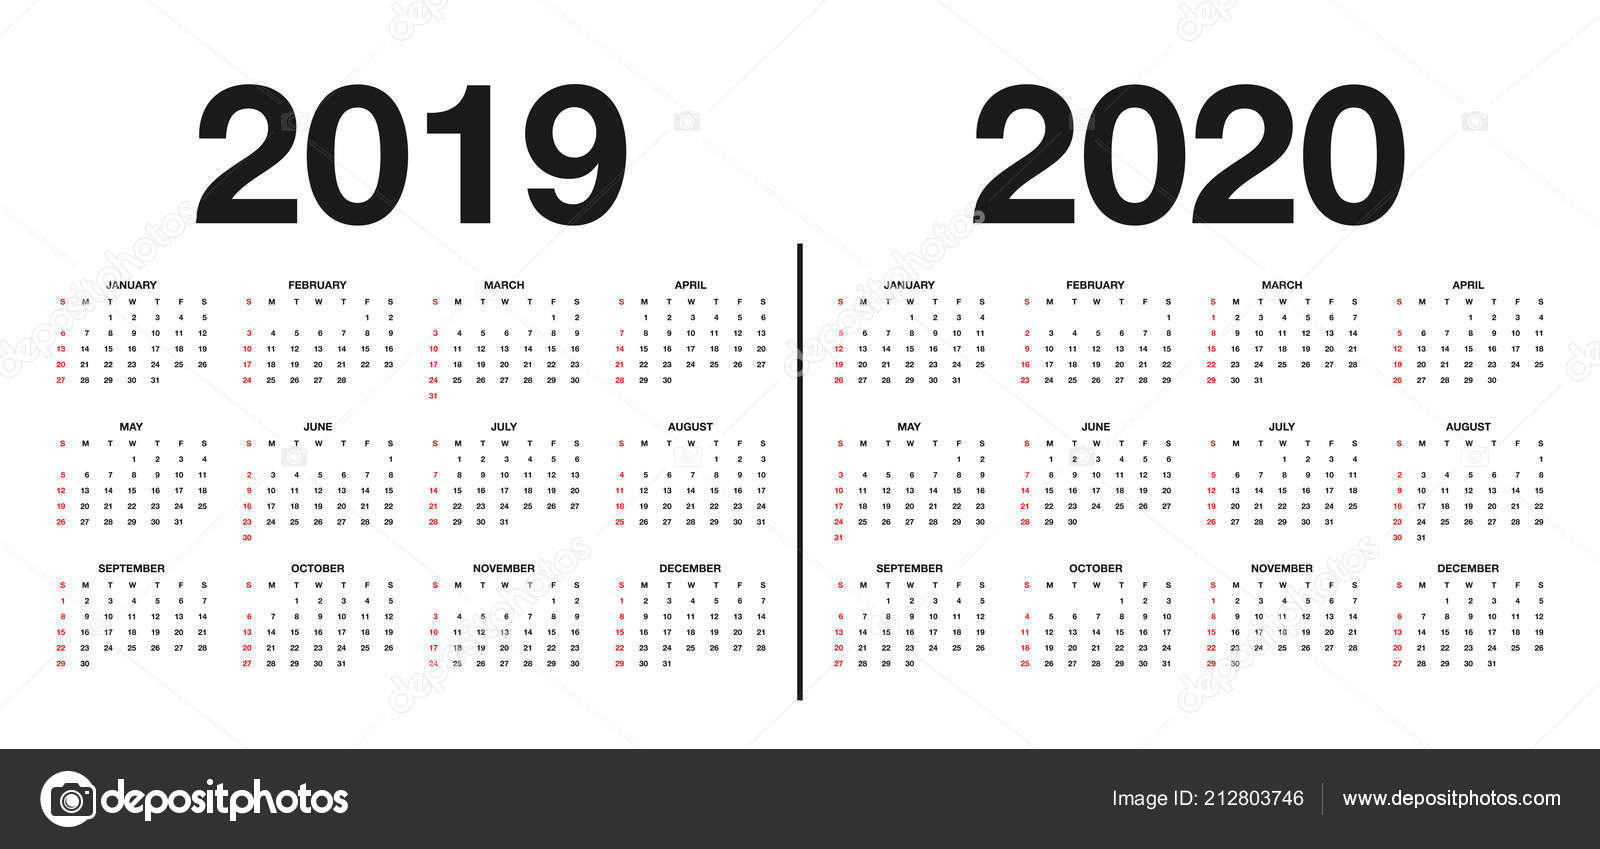 Шаблон Календаря 2020 | Календарь 2019 2020 Шаблон Дизайн Календаря regarding Calendar For Rest Of 2019 And 2020